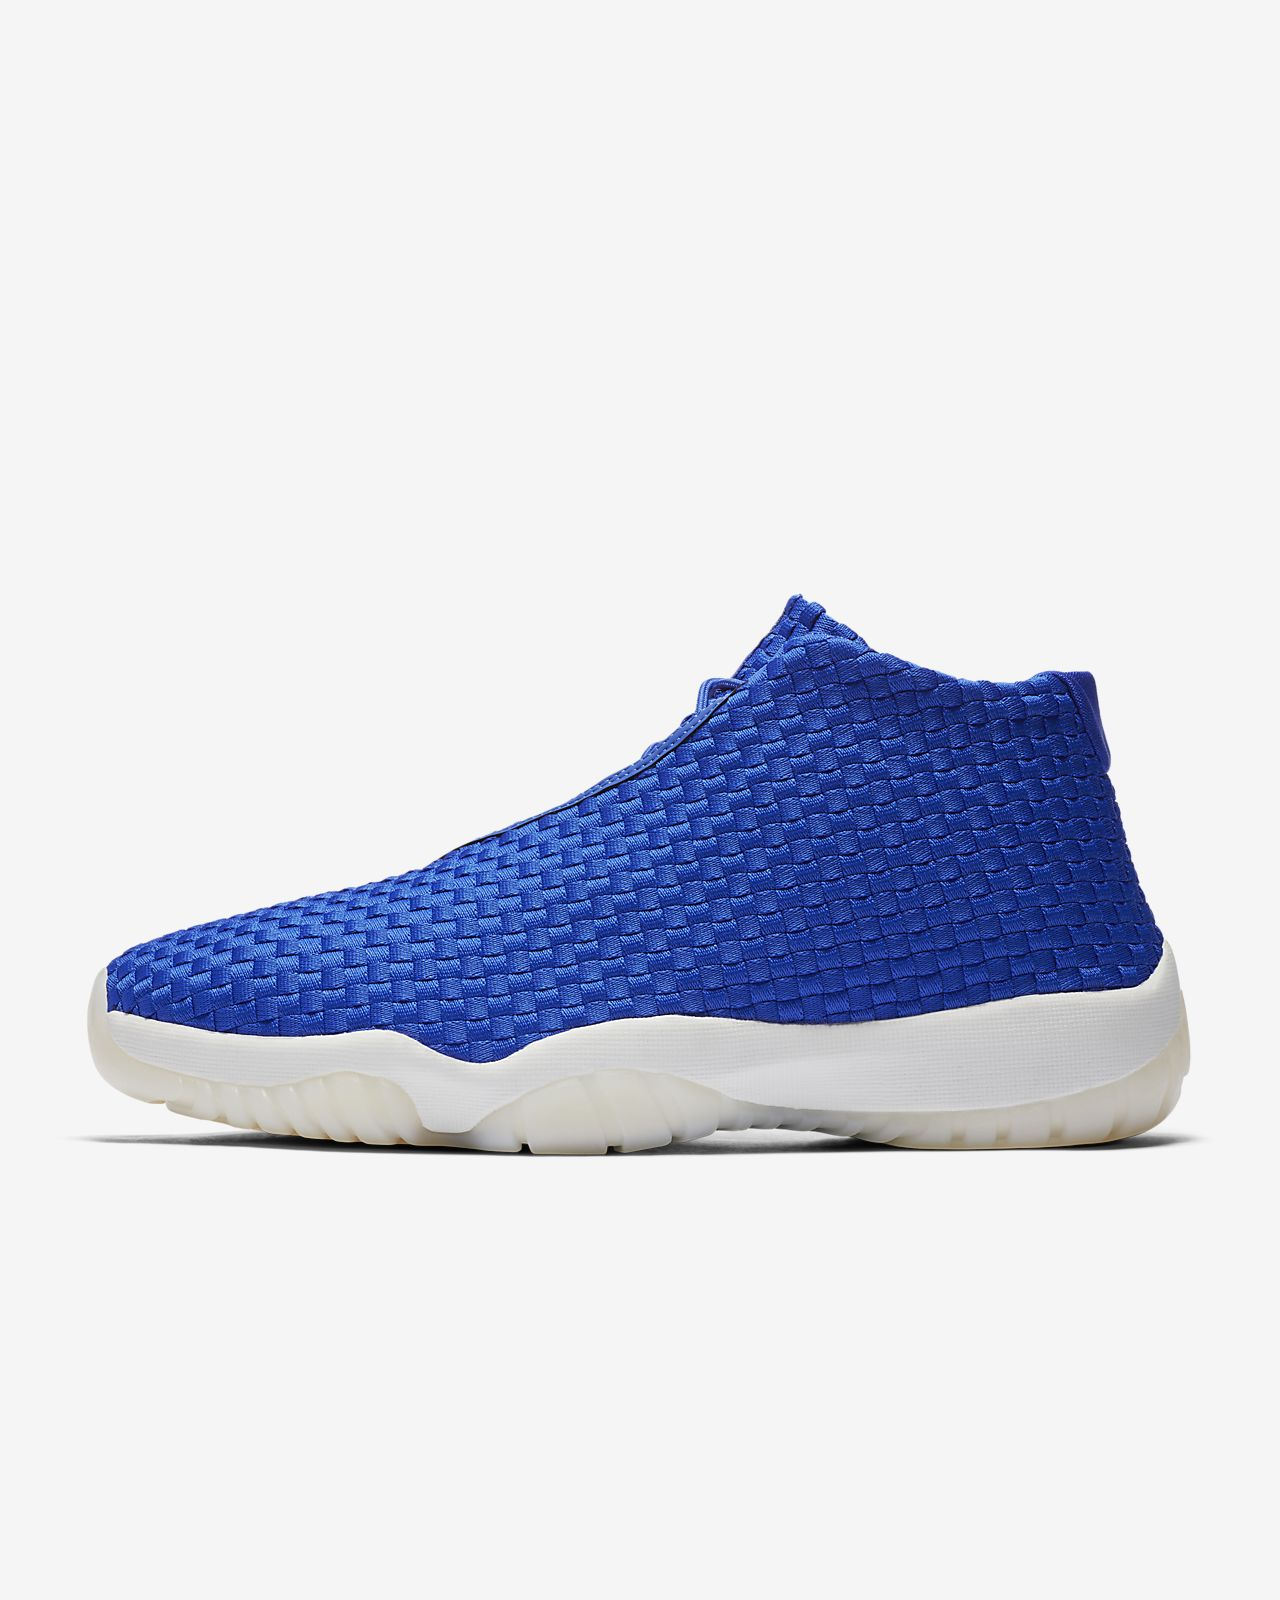 Chaussure Air Jordan Future pour Homme